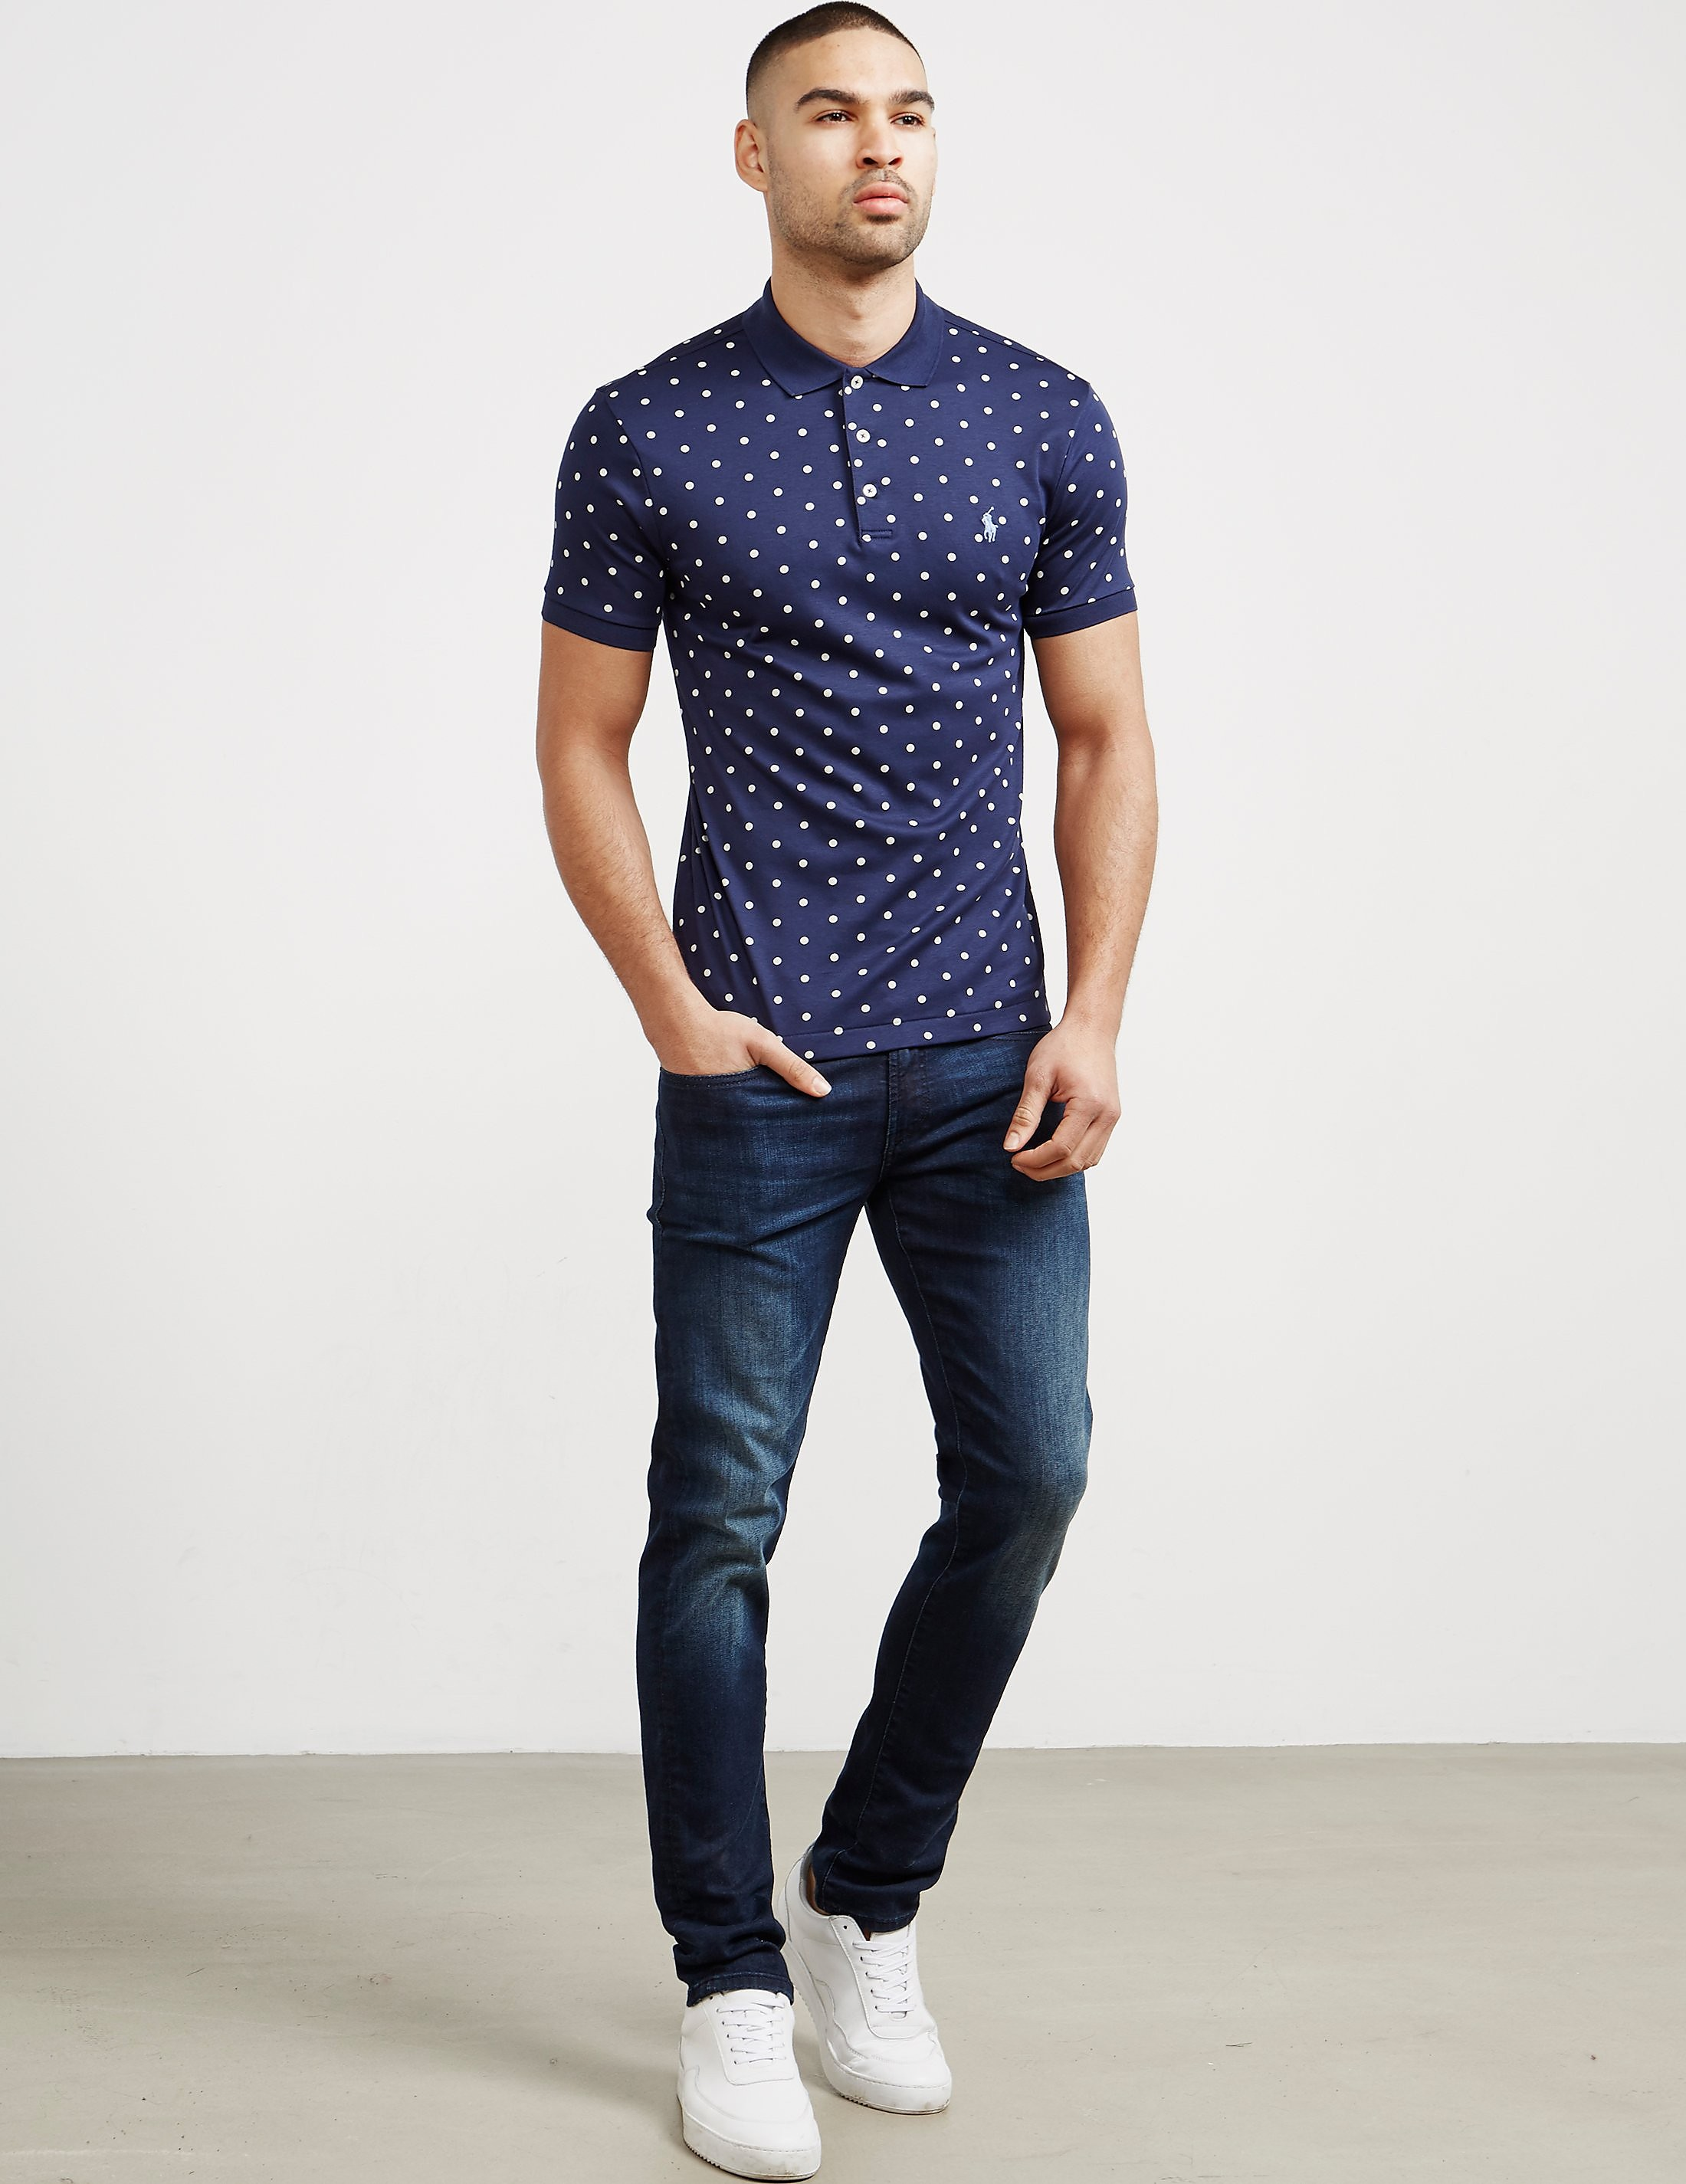 Polo Ralph Lauren Polka Dot Short Sleeve Polo Shirt